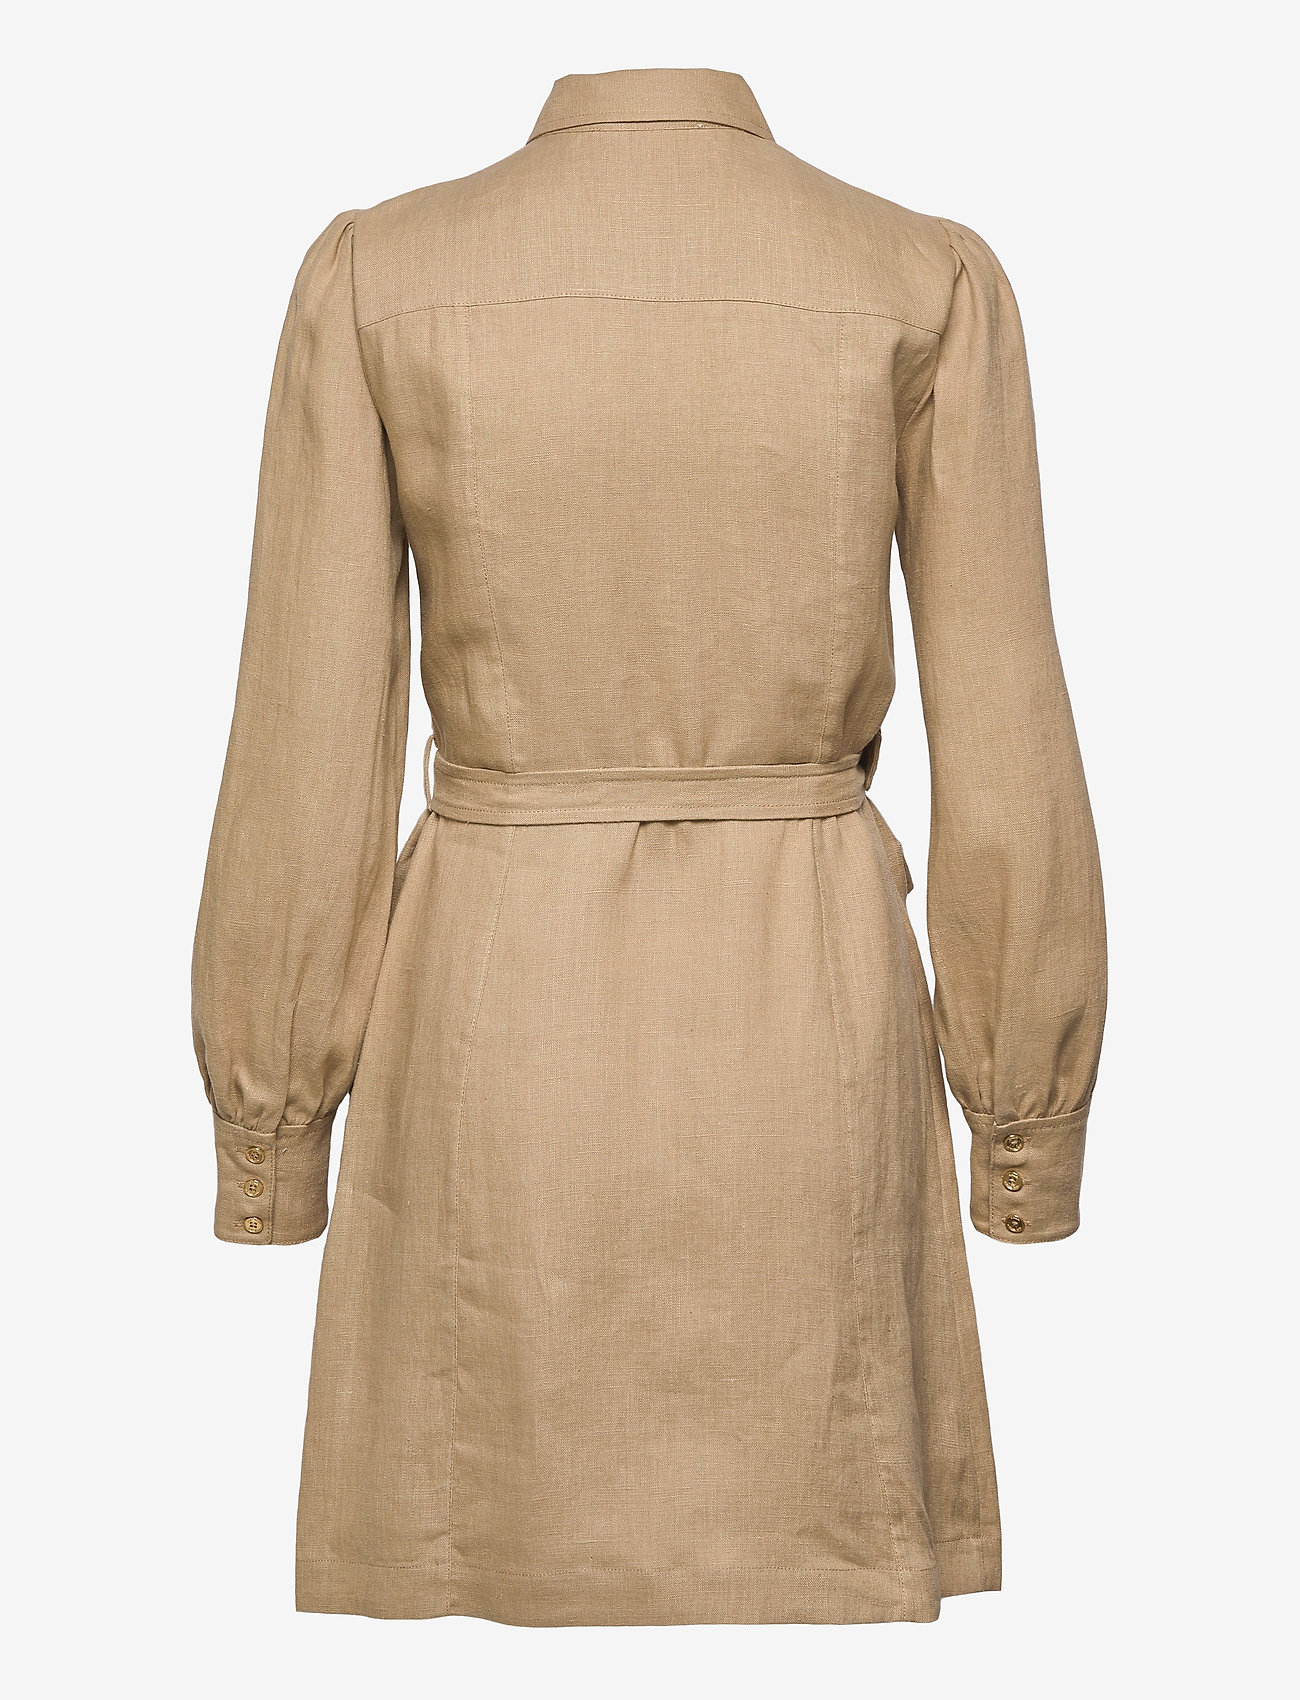 Michael Kors - HEMP UTILITY MINI DRESS - blousejurken - khaki - 1